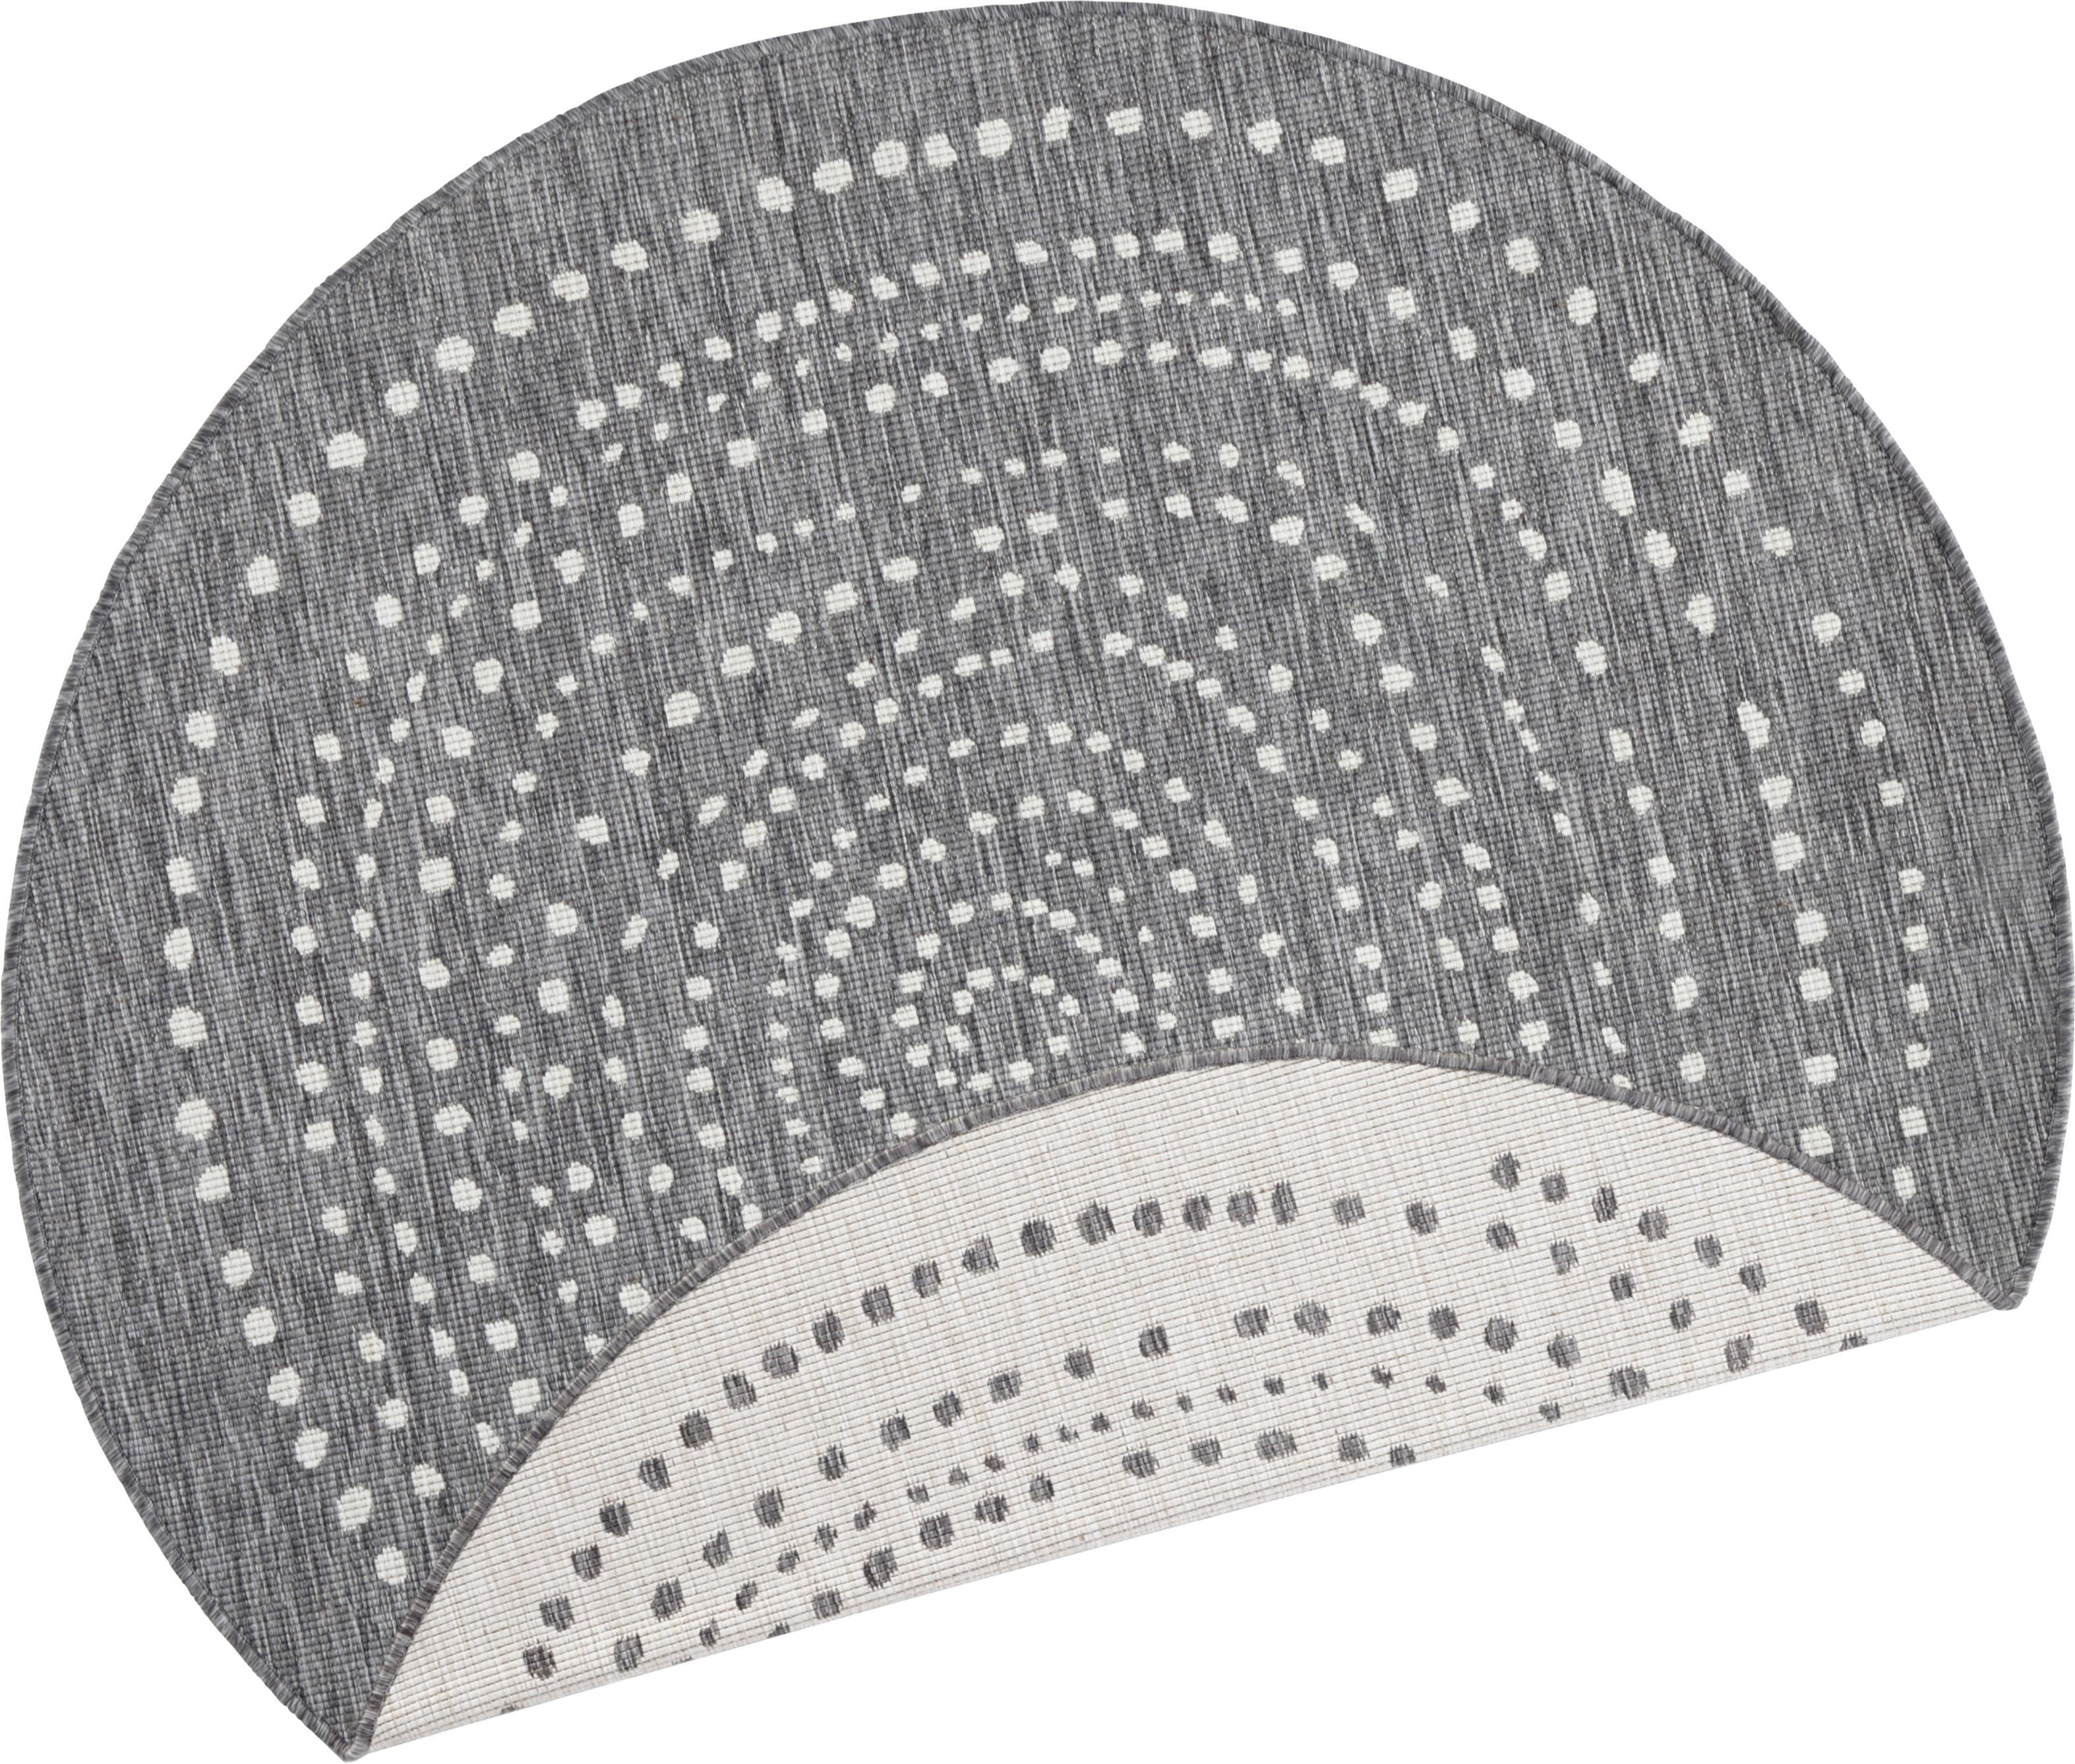 Alfombra redonda reversible de interior/exterior Bali, Gris, crema, Ø 200 cm (Tamaño L)